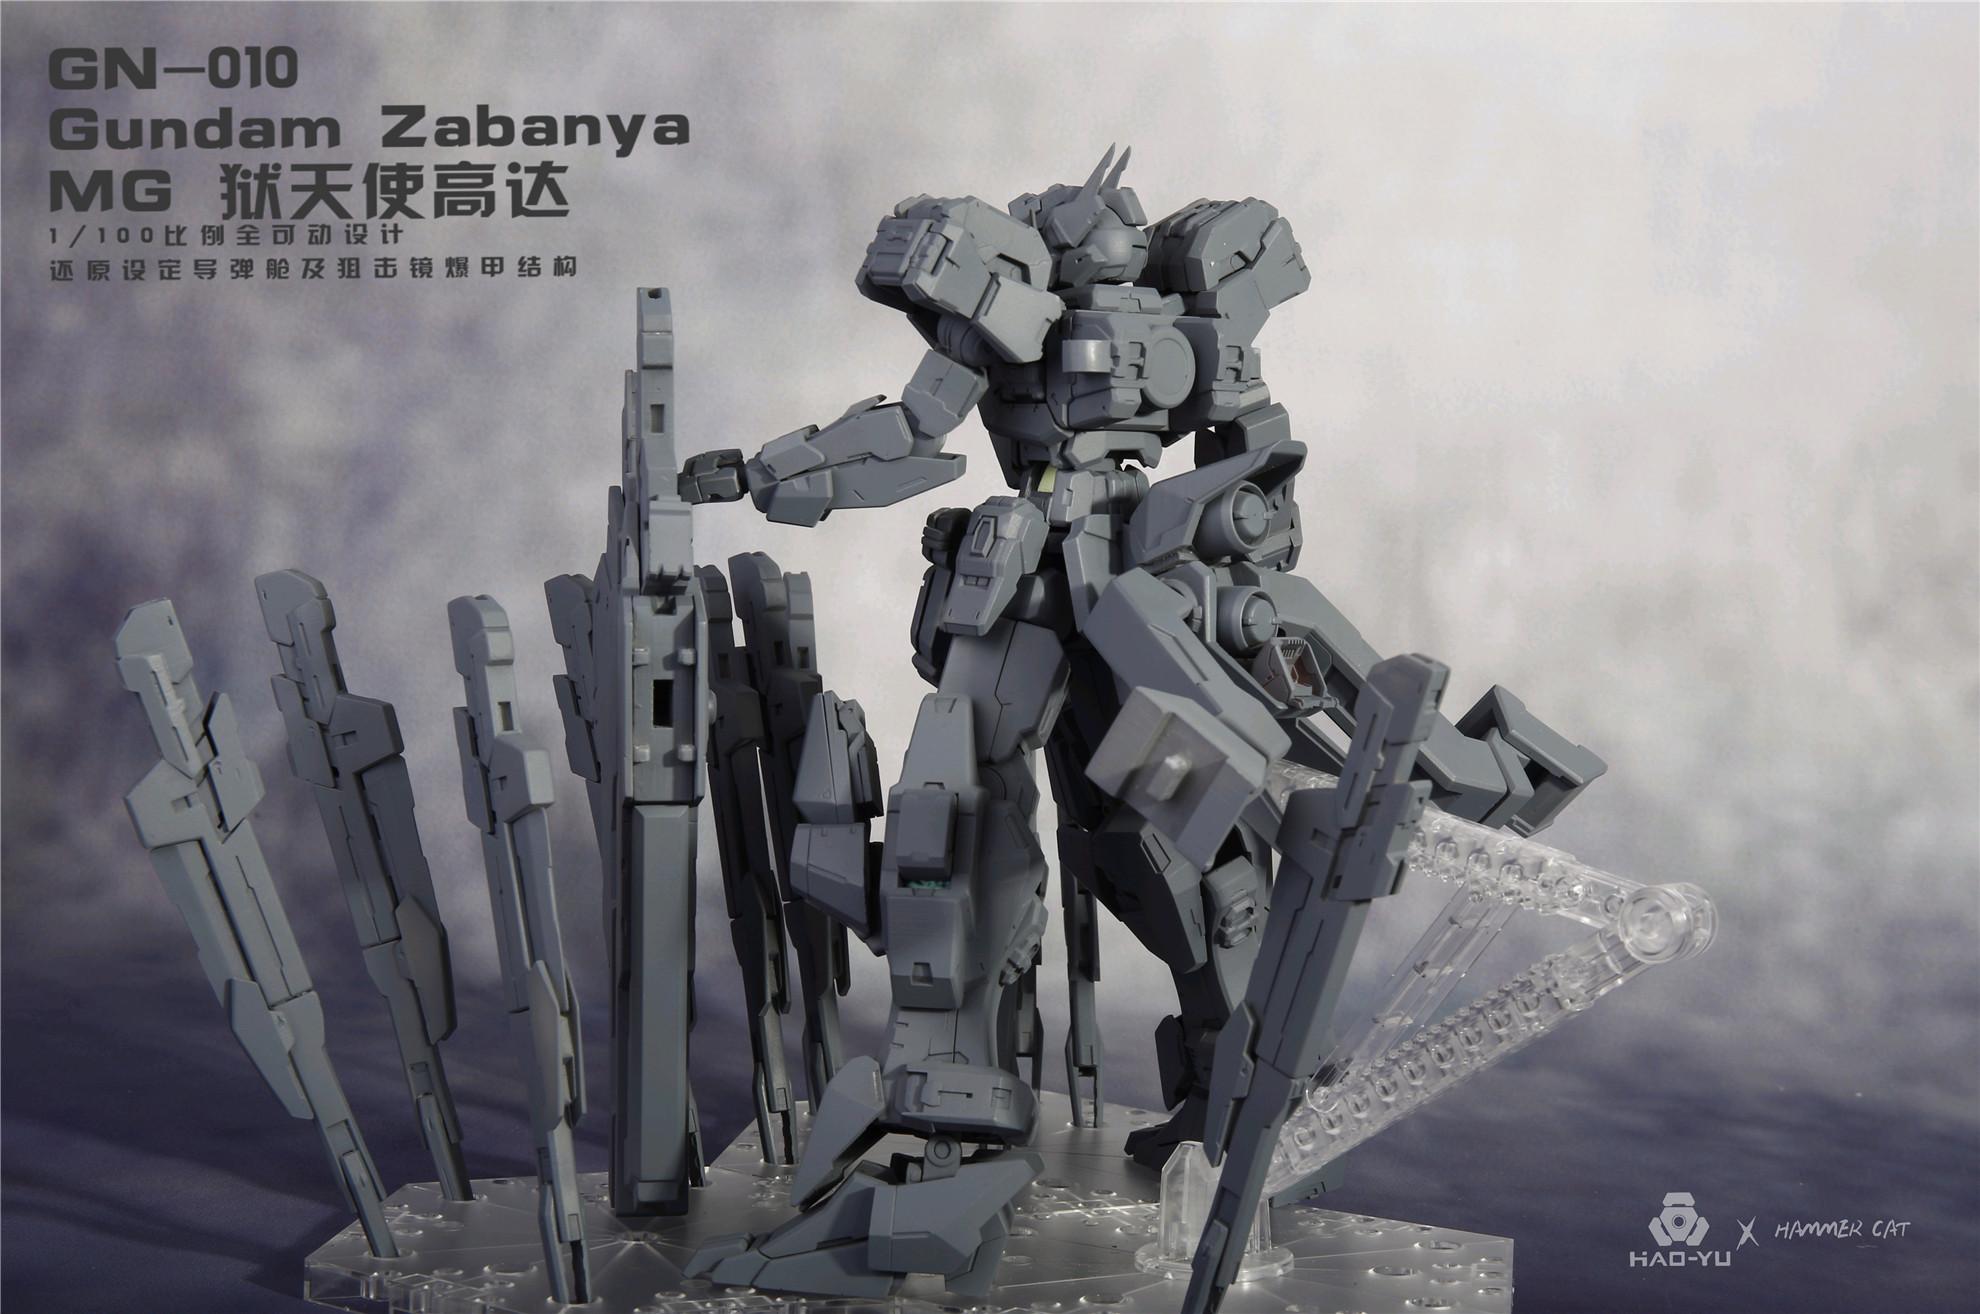 G652_Gundam_Zabanya_003.jpg